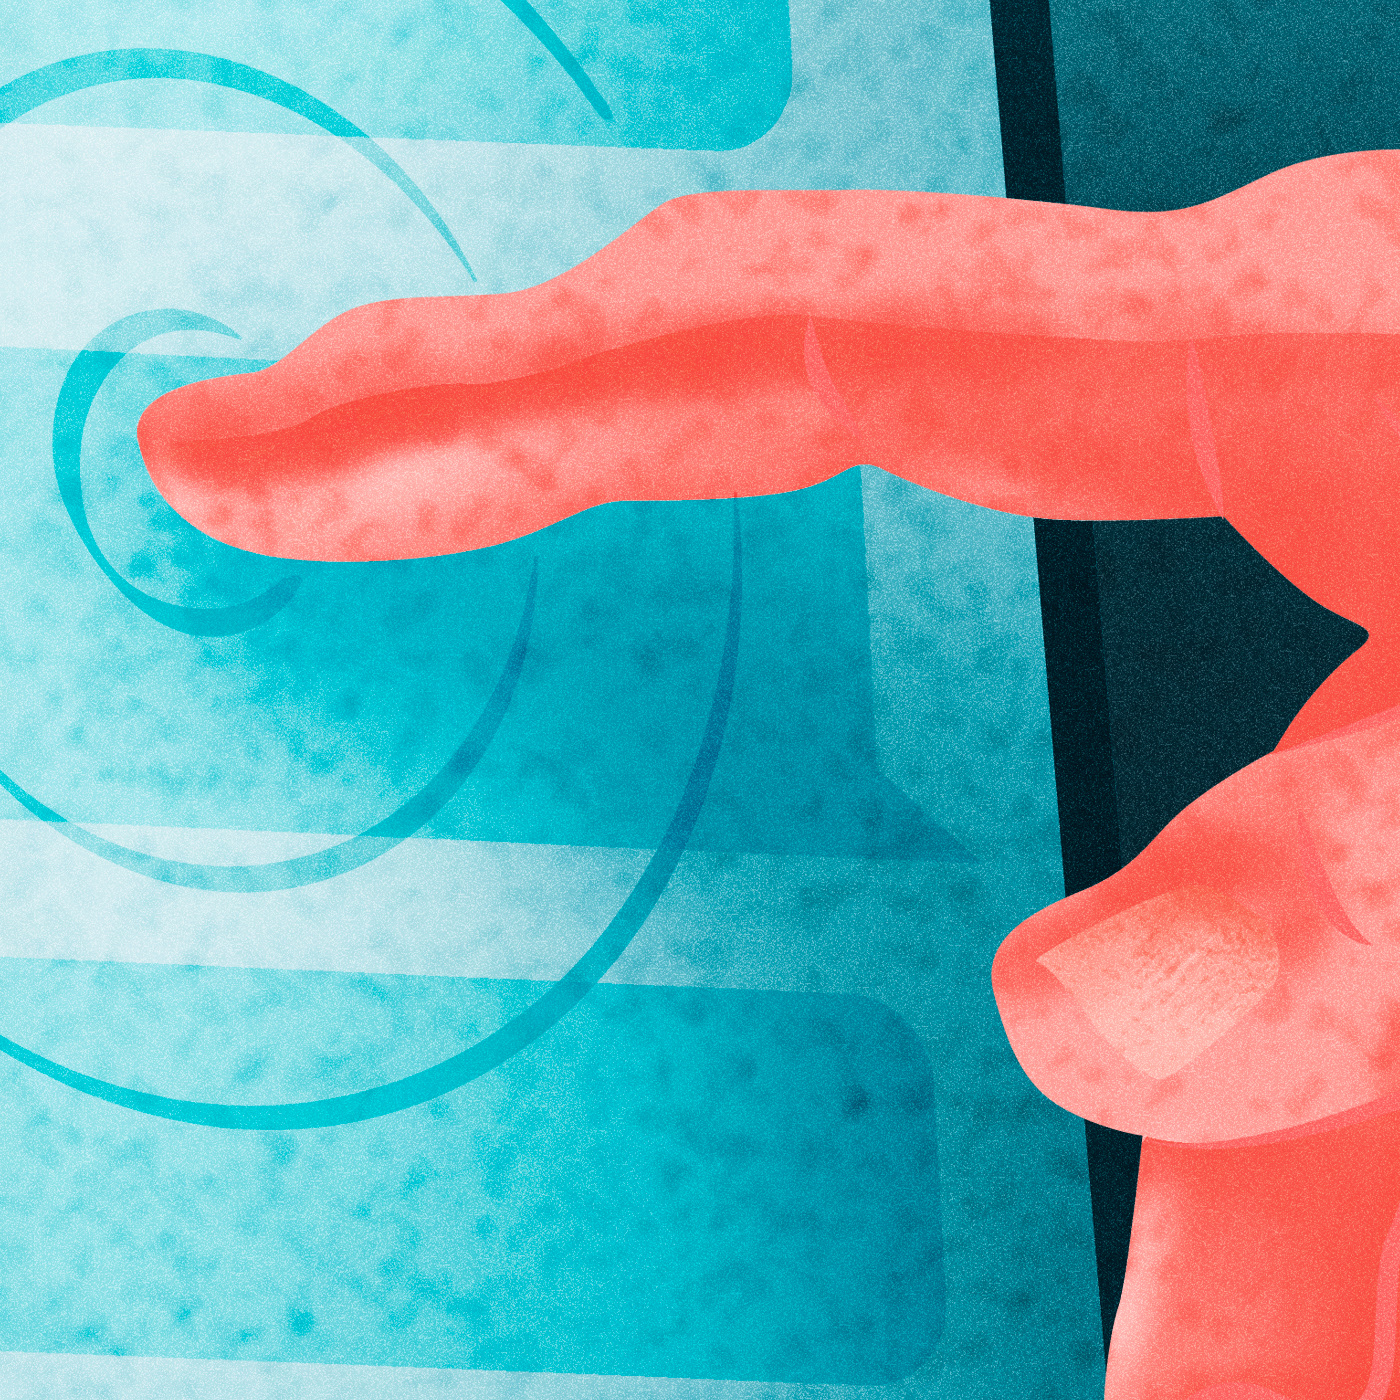 artwork brush COVID-19 digital draw flat Illustrator ilustration portfolio Quarantine